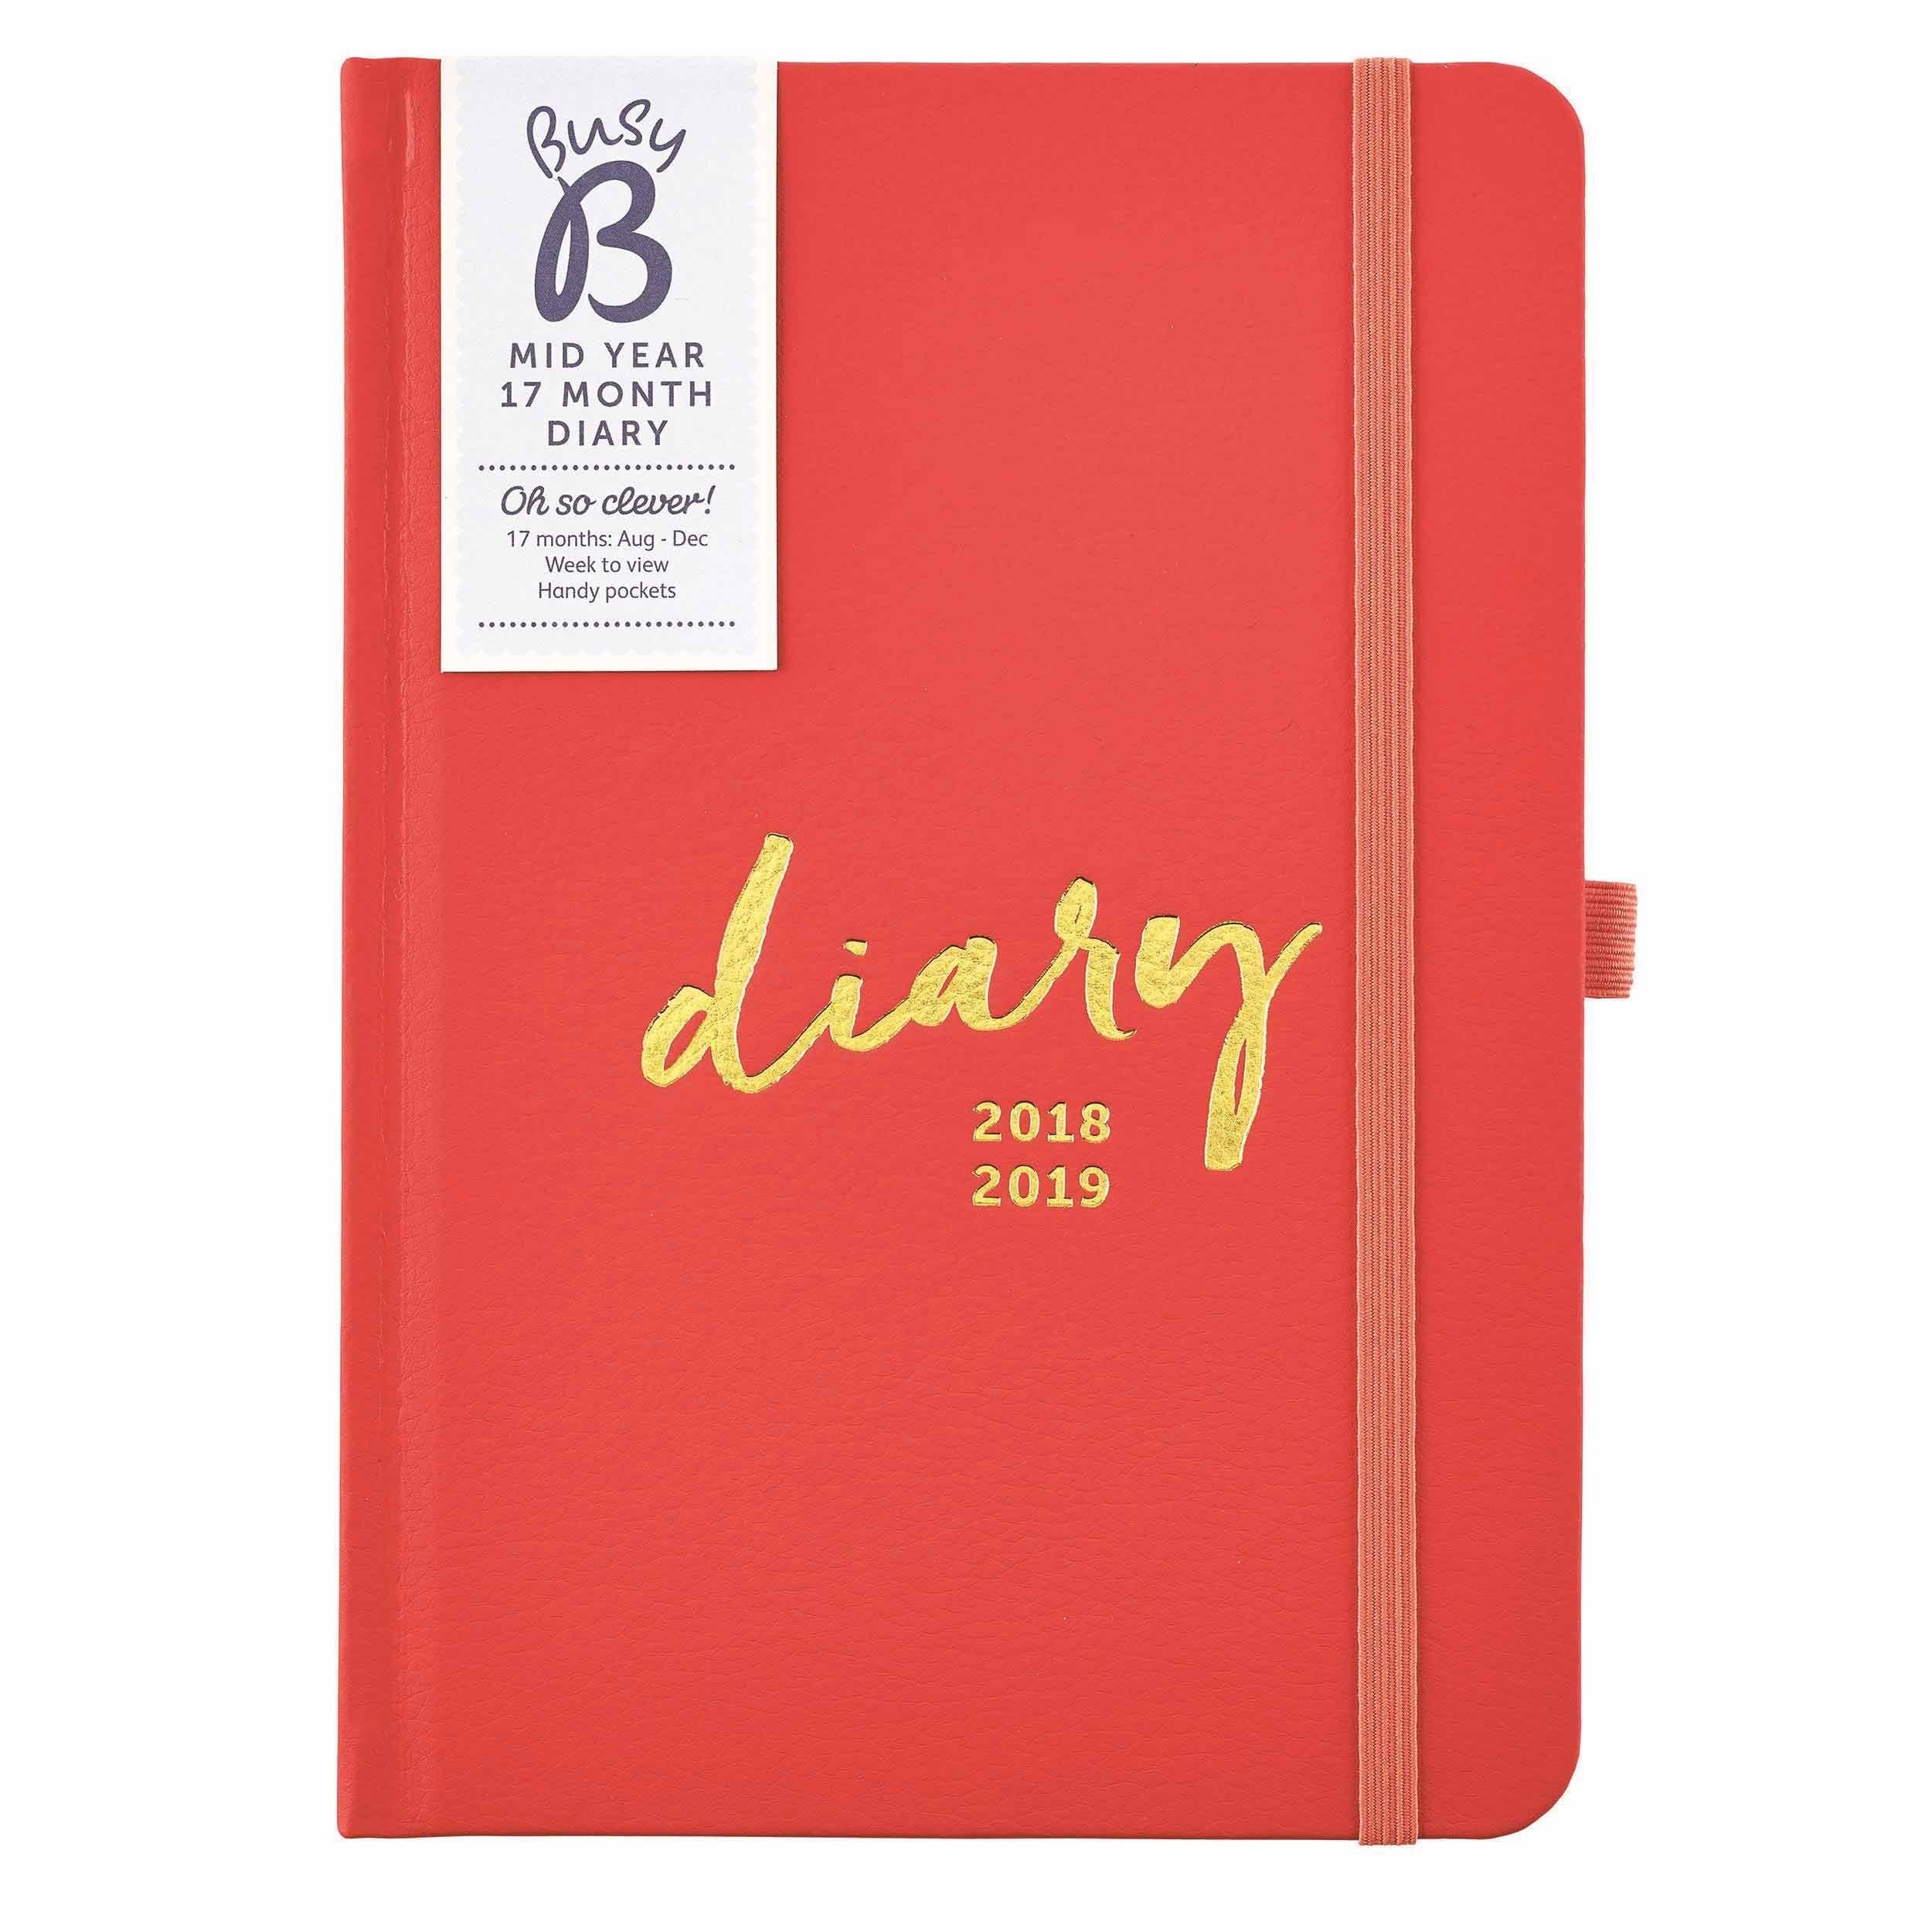 Busy B Mid Year A5 Diary 2018 - 2019 | 2017 Calendars In 2018 Busy B Calendar 2019